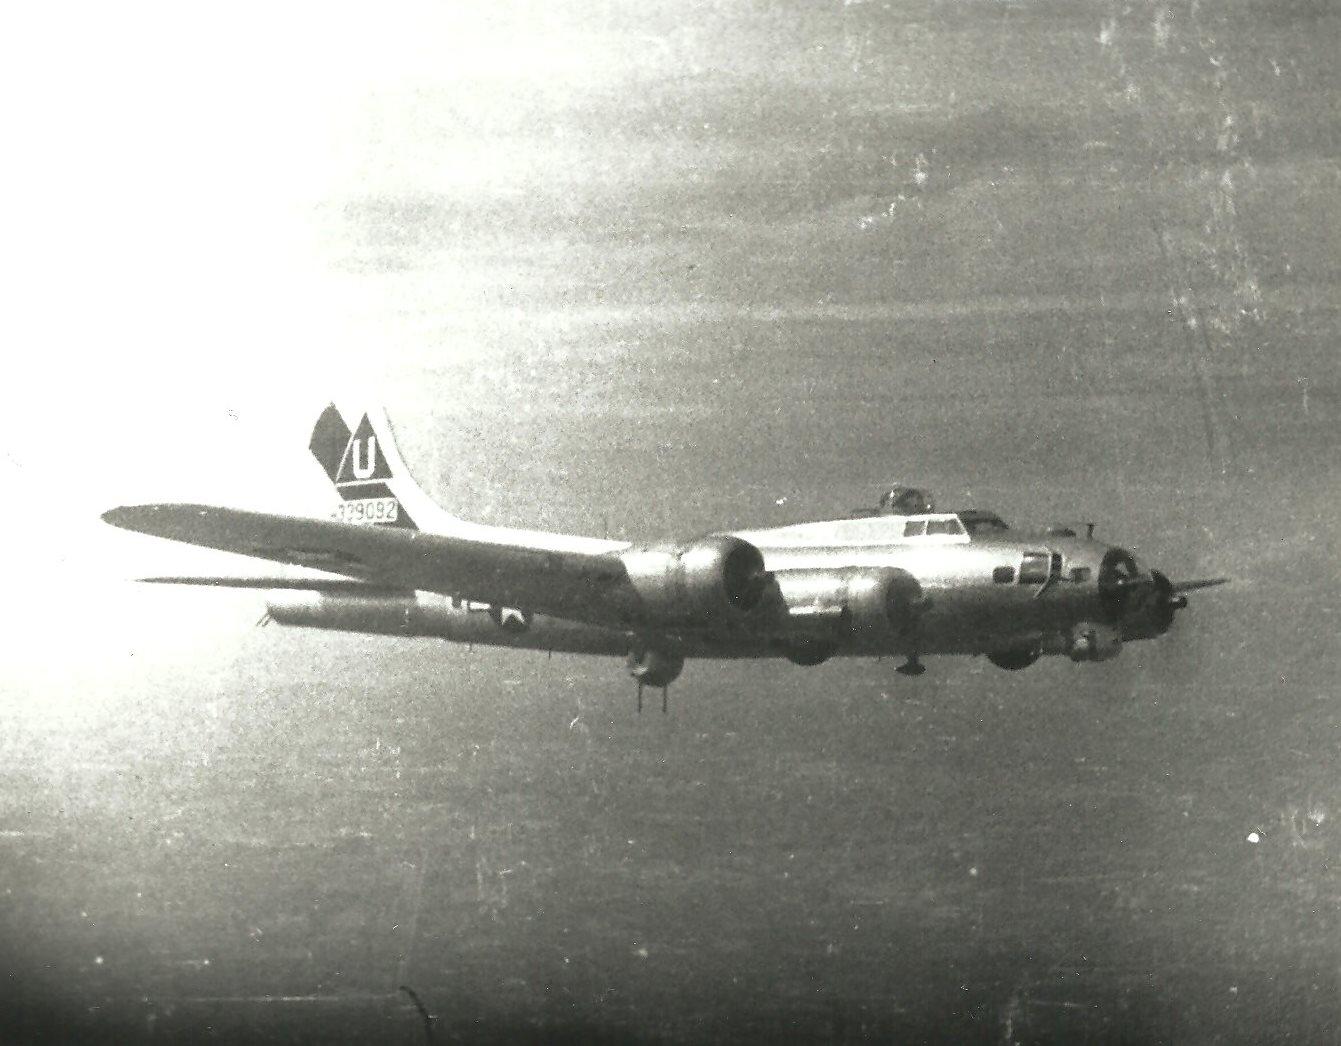 B-17 #43-39092